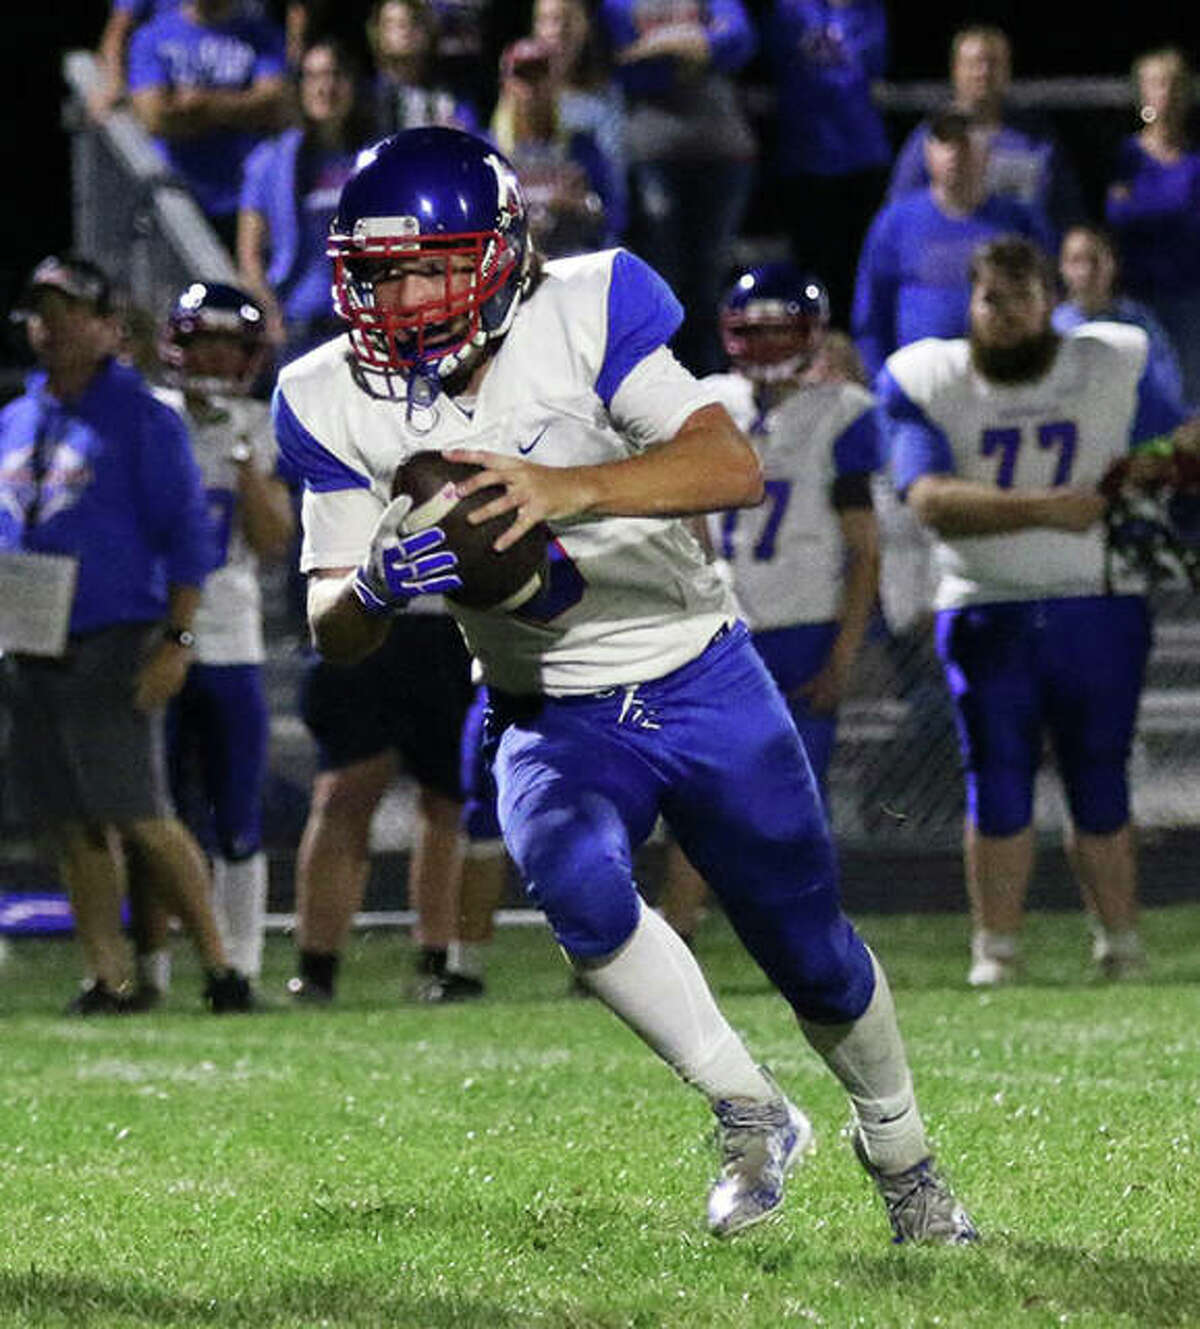 Carlinville quarterback Ayden Tiburzi looks for running room in last Friday's SCC football game against Southwestern at Knapp Field in Piasa.